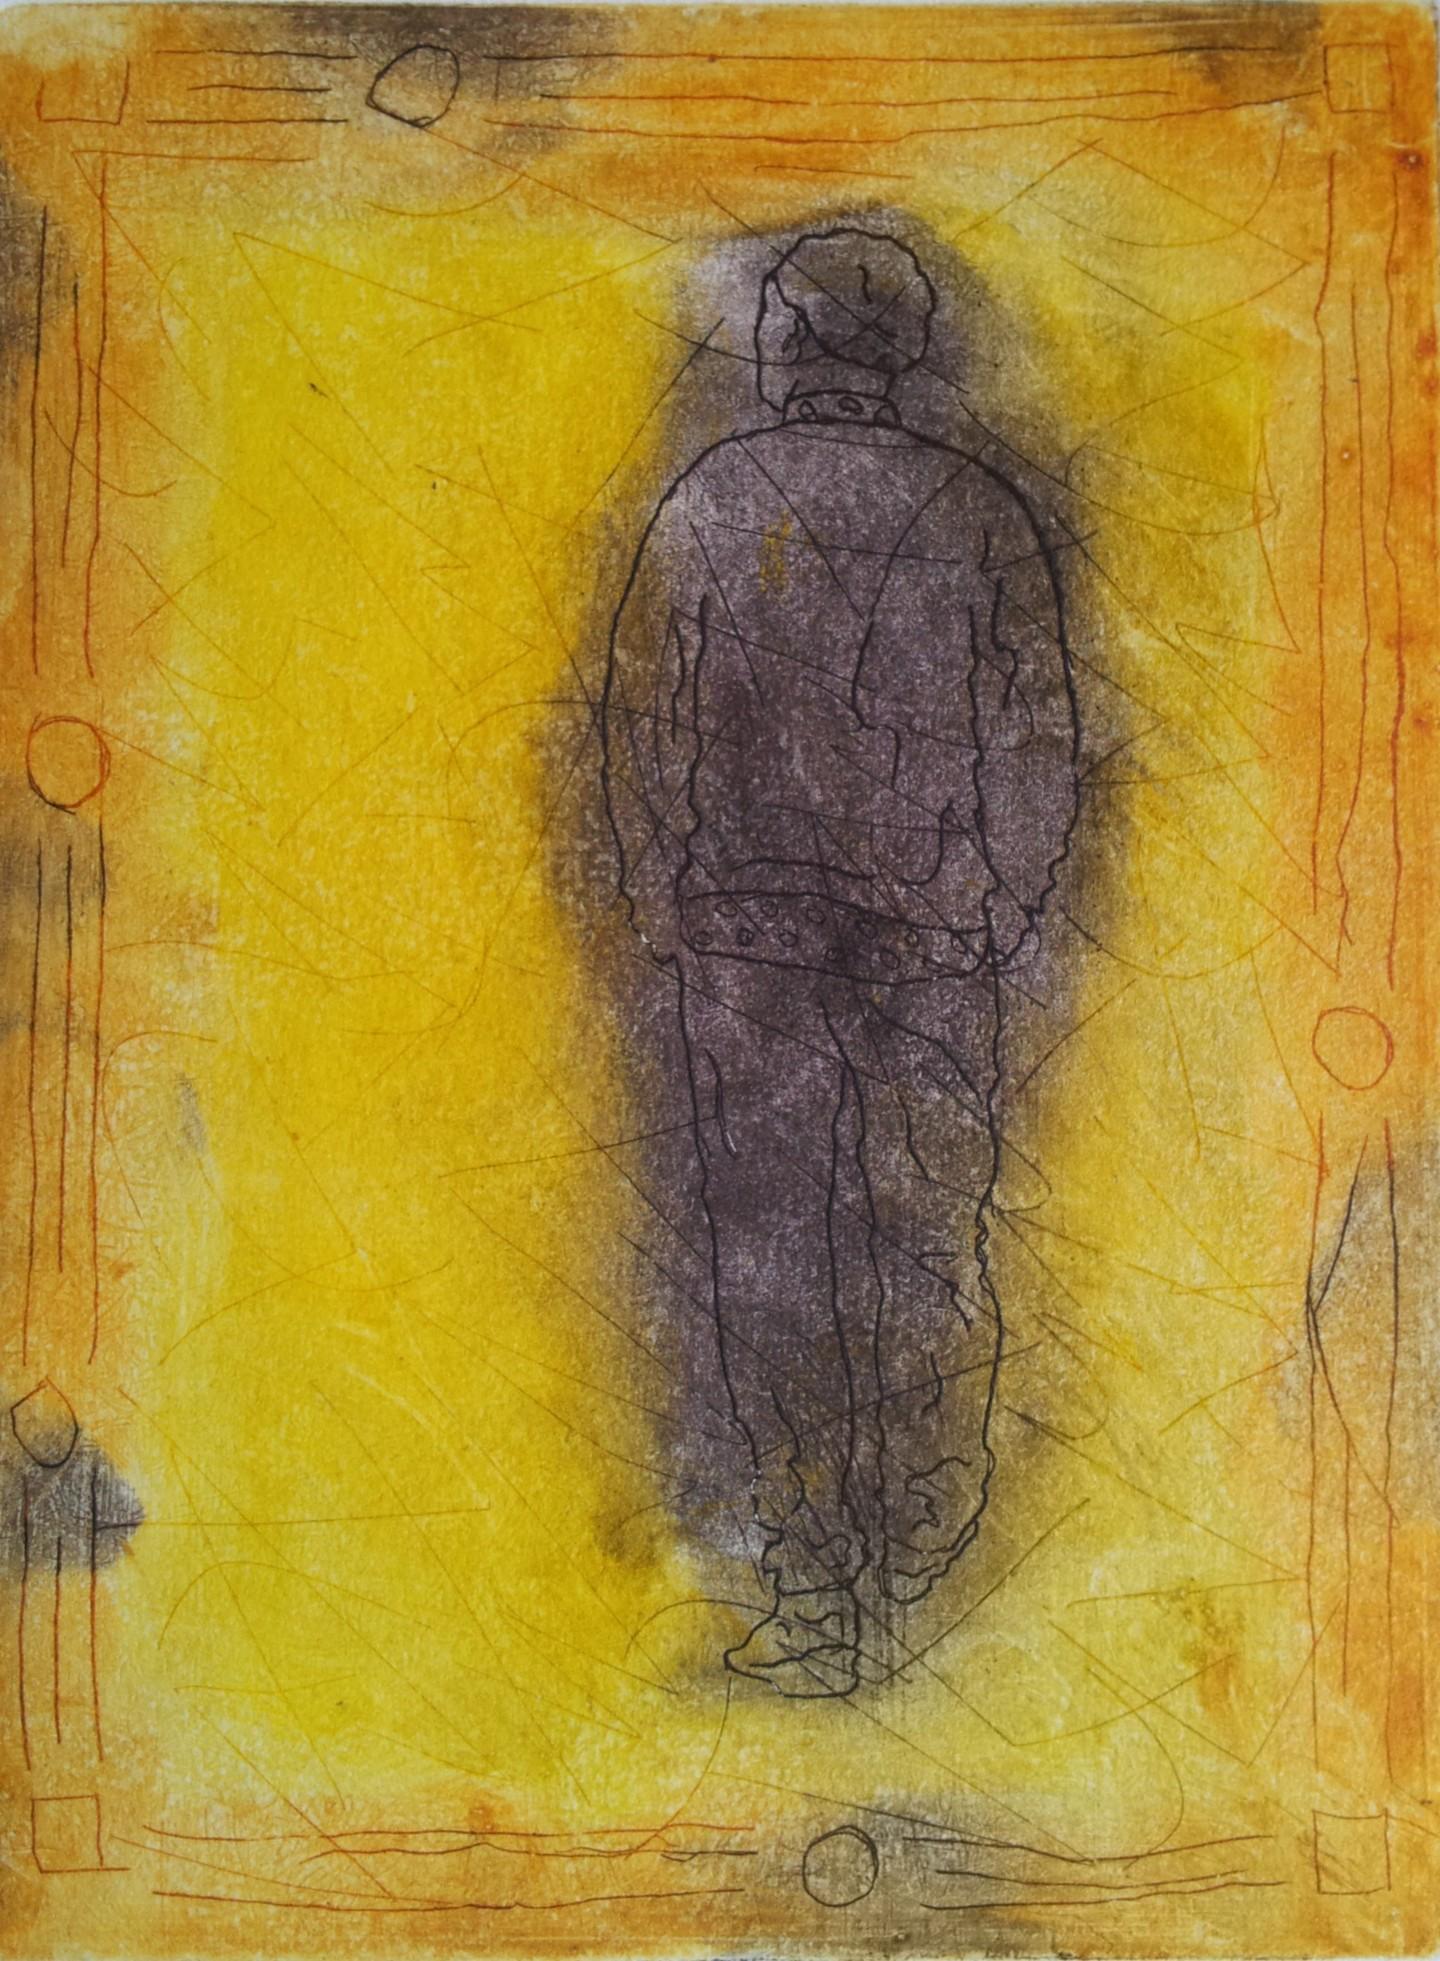 Rosemary Piolais - Piolais-le-solitaire-Gravure-20x14,7cm